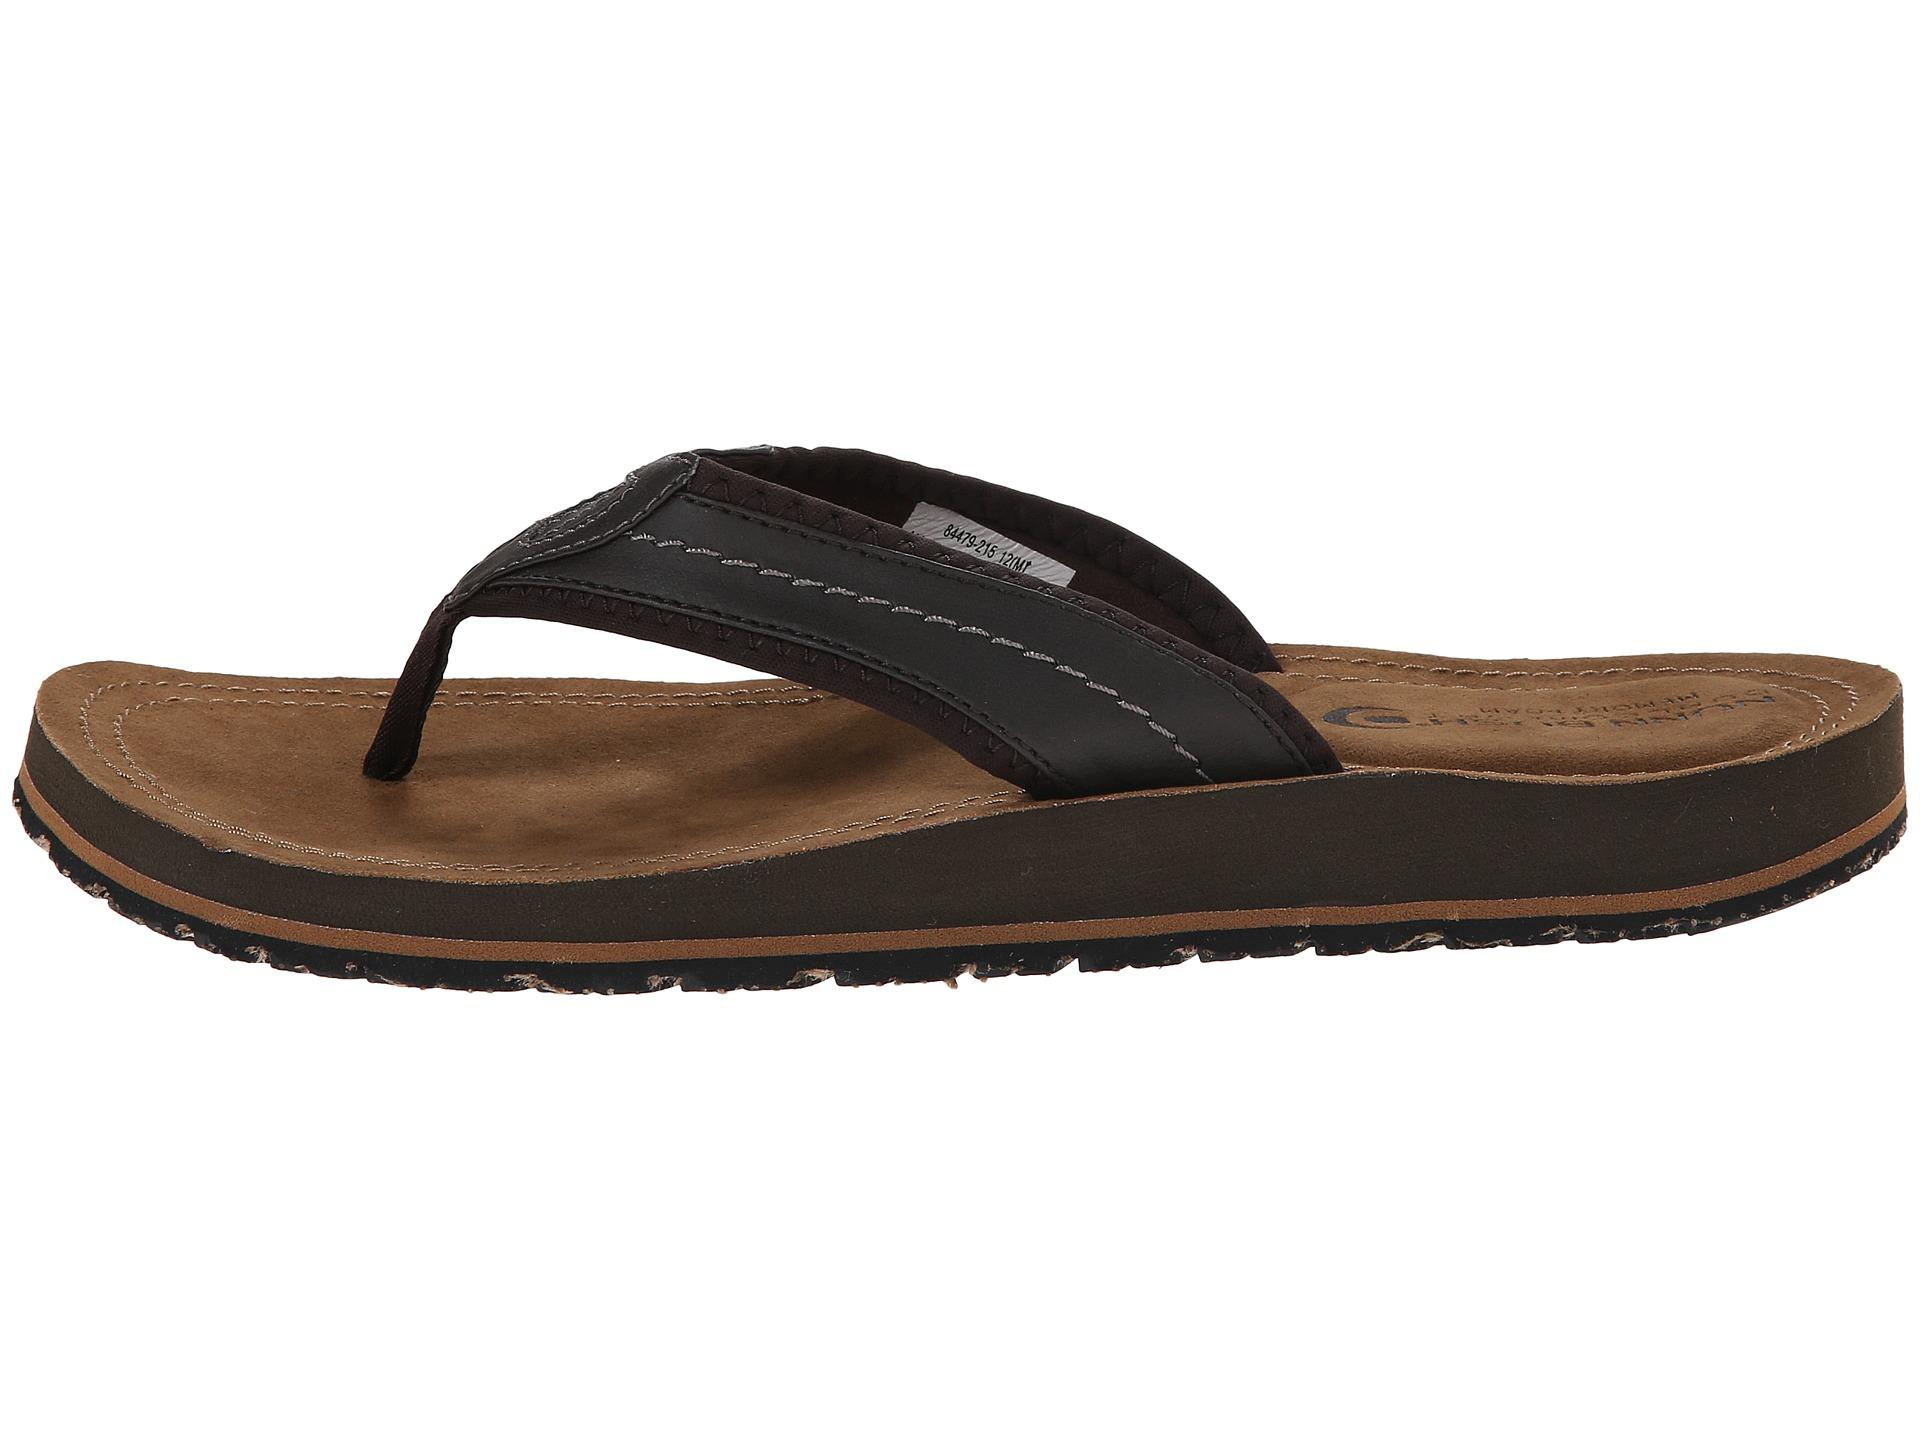 aerosole sandals zappos sandals thong